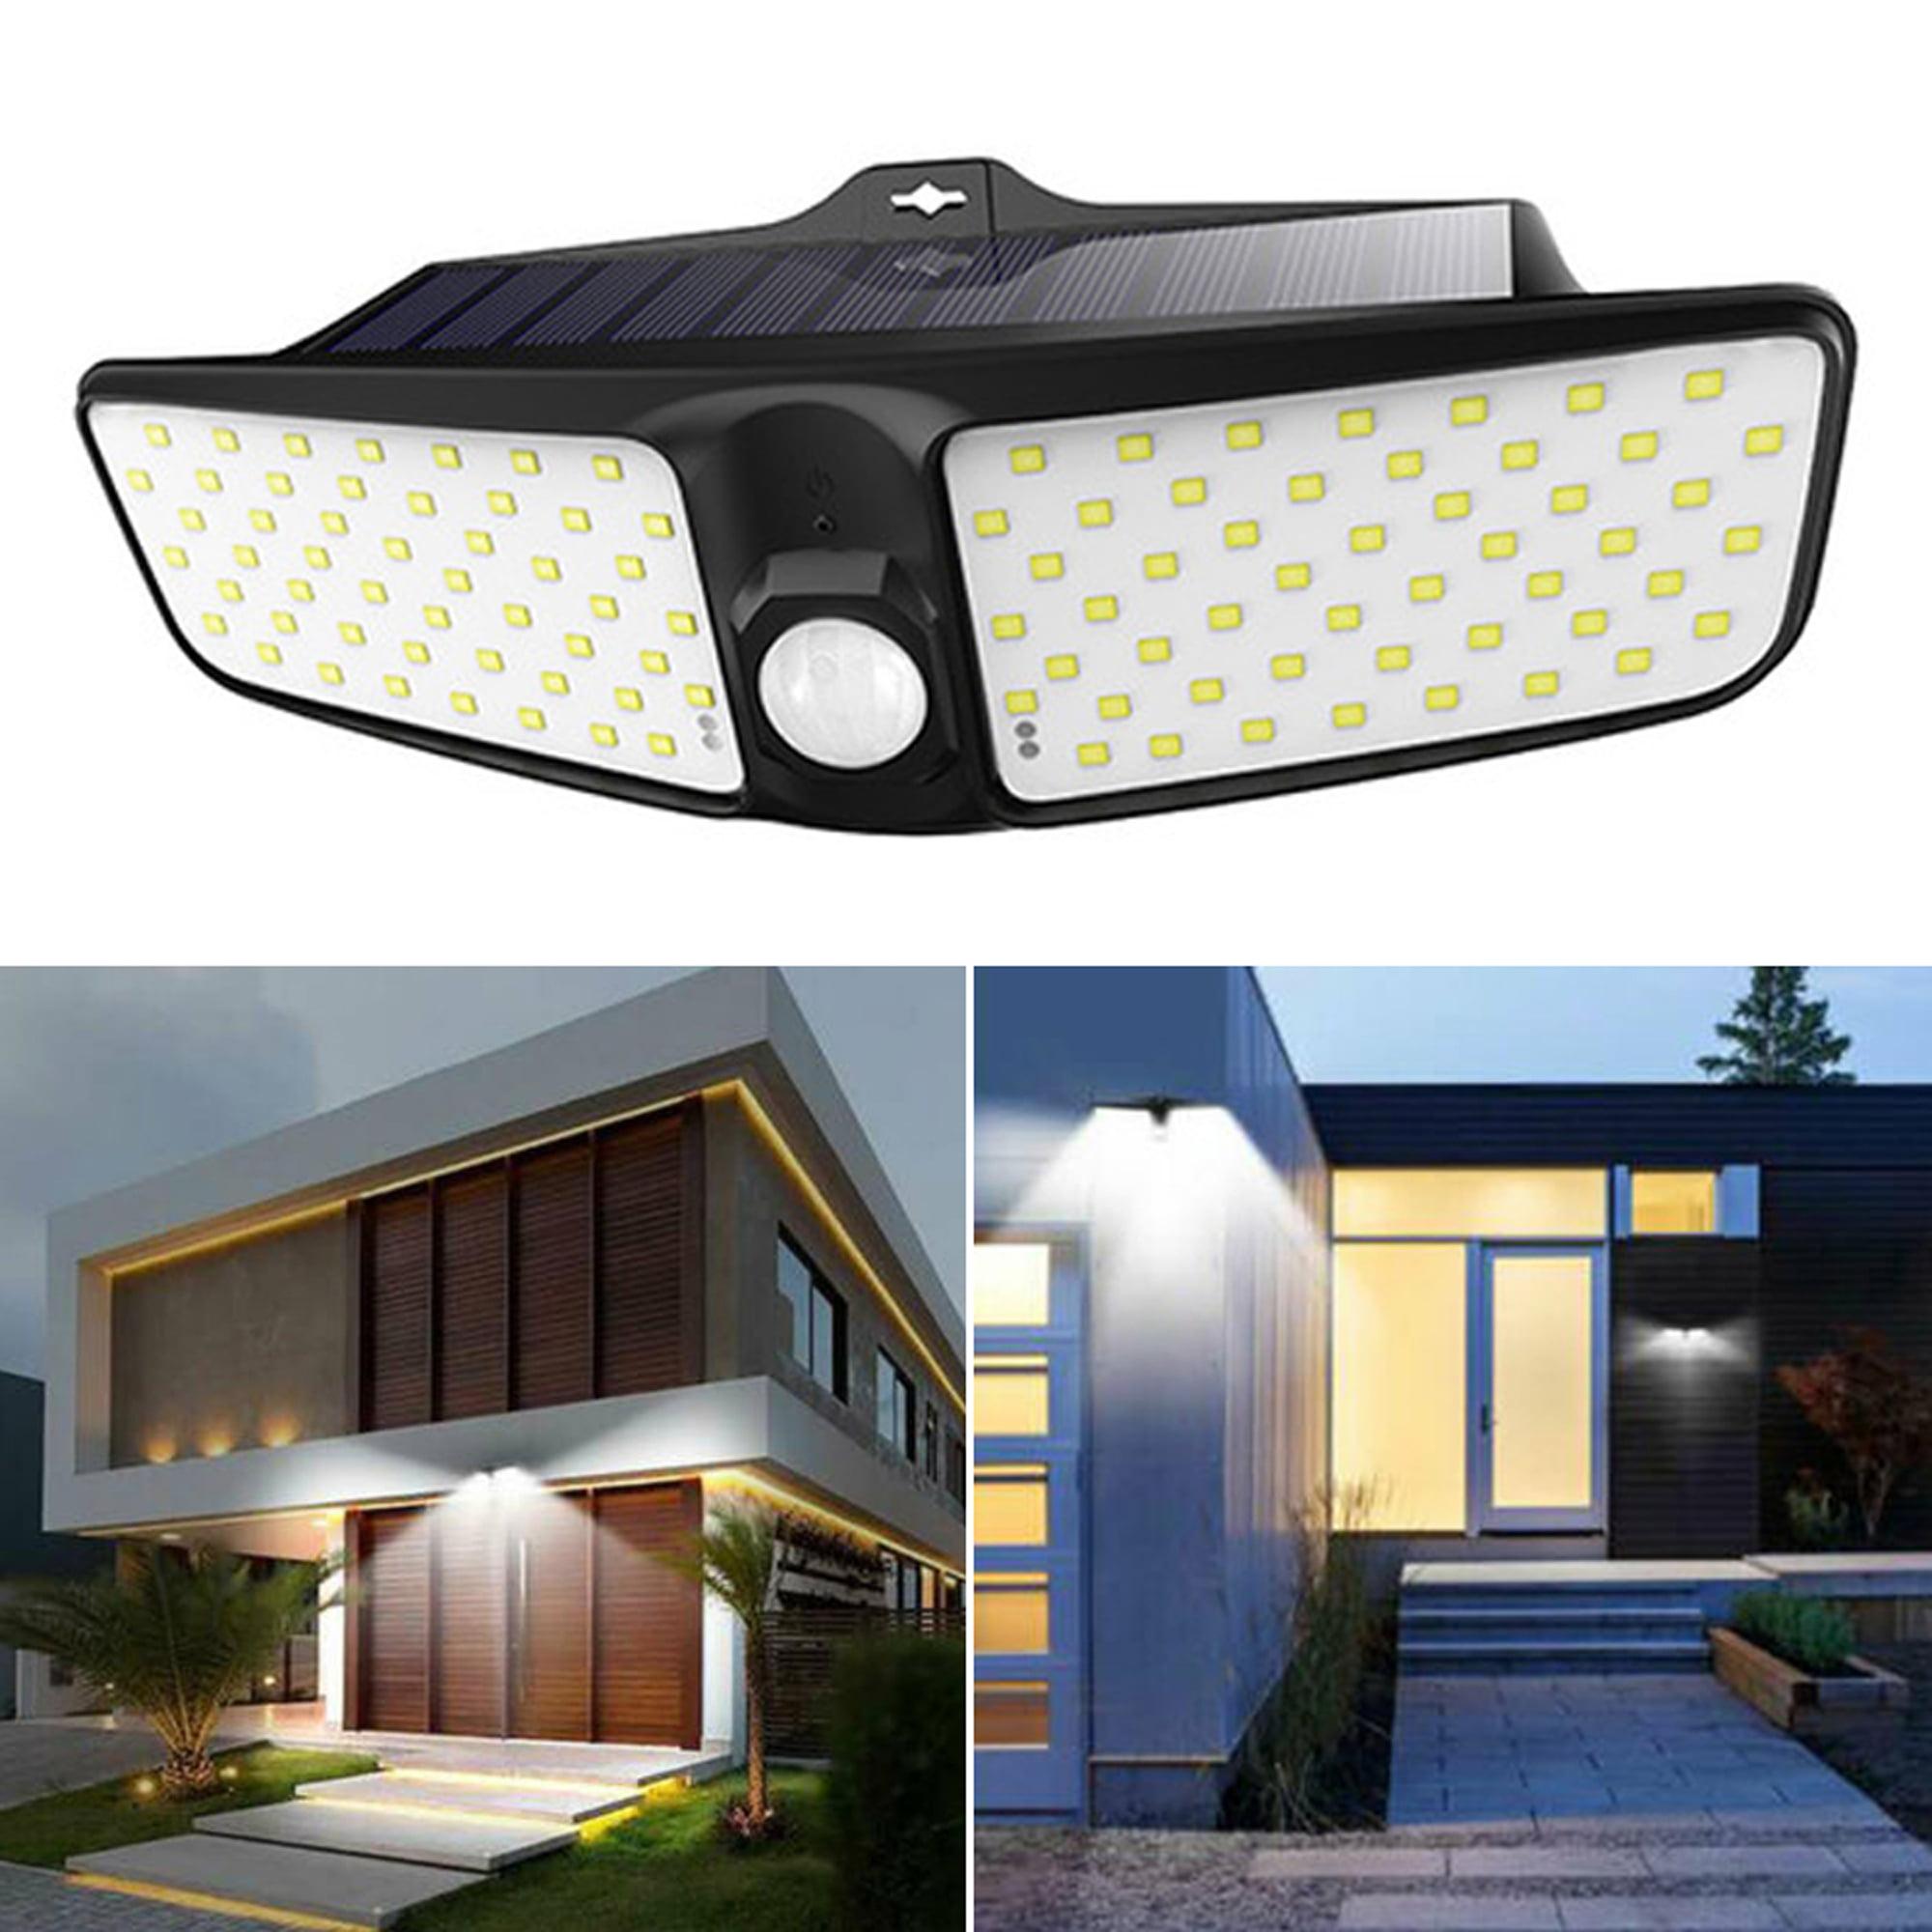 100 LED Security Detector Solar Spot Light Motion Sensor Outdoor Yard Floodlight